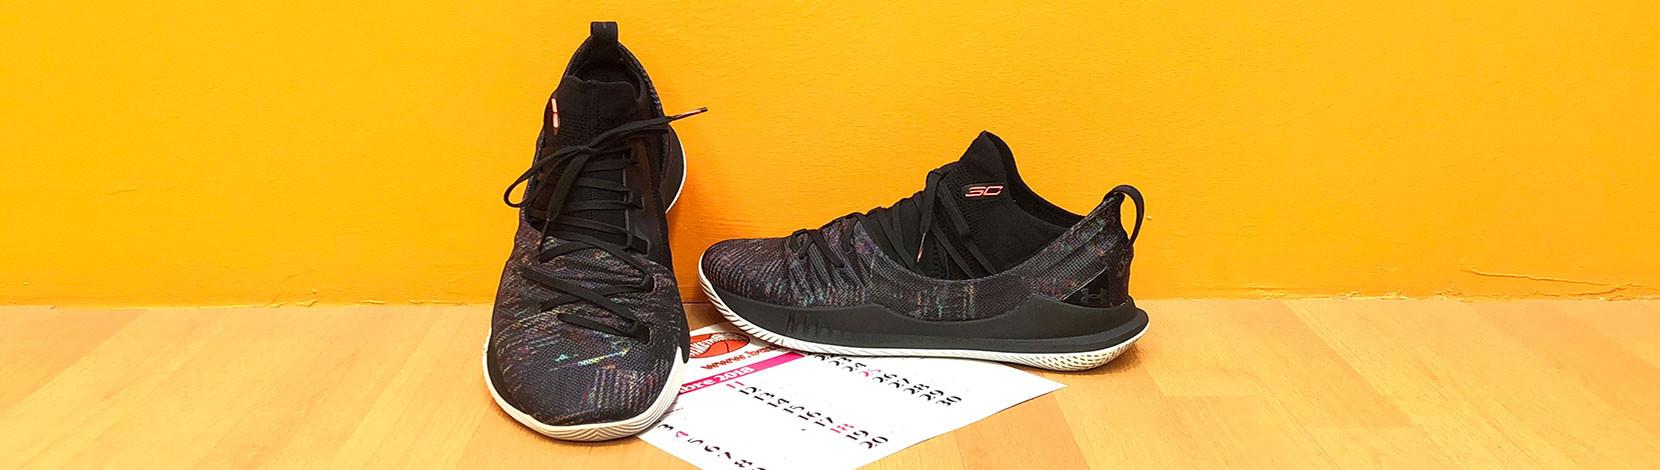 Scarpe da basket in arrivo | Basketmania Release